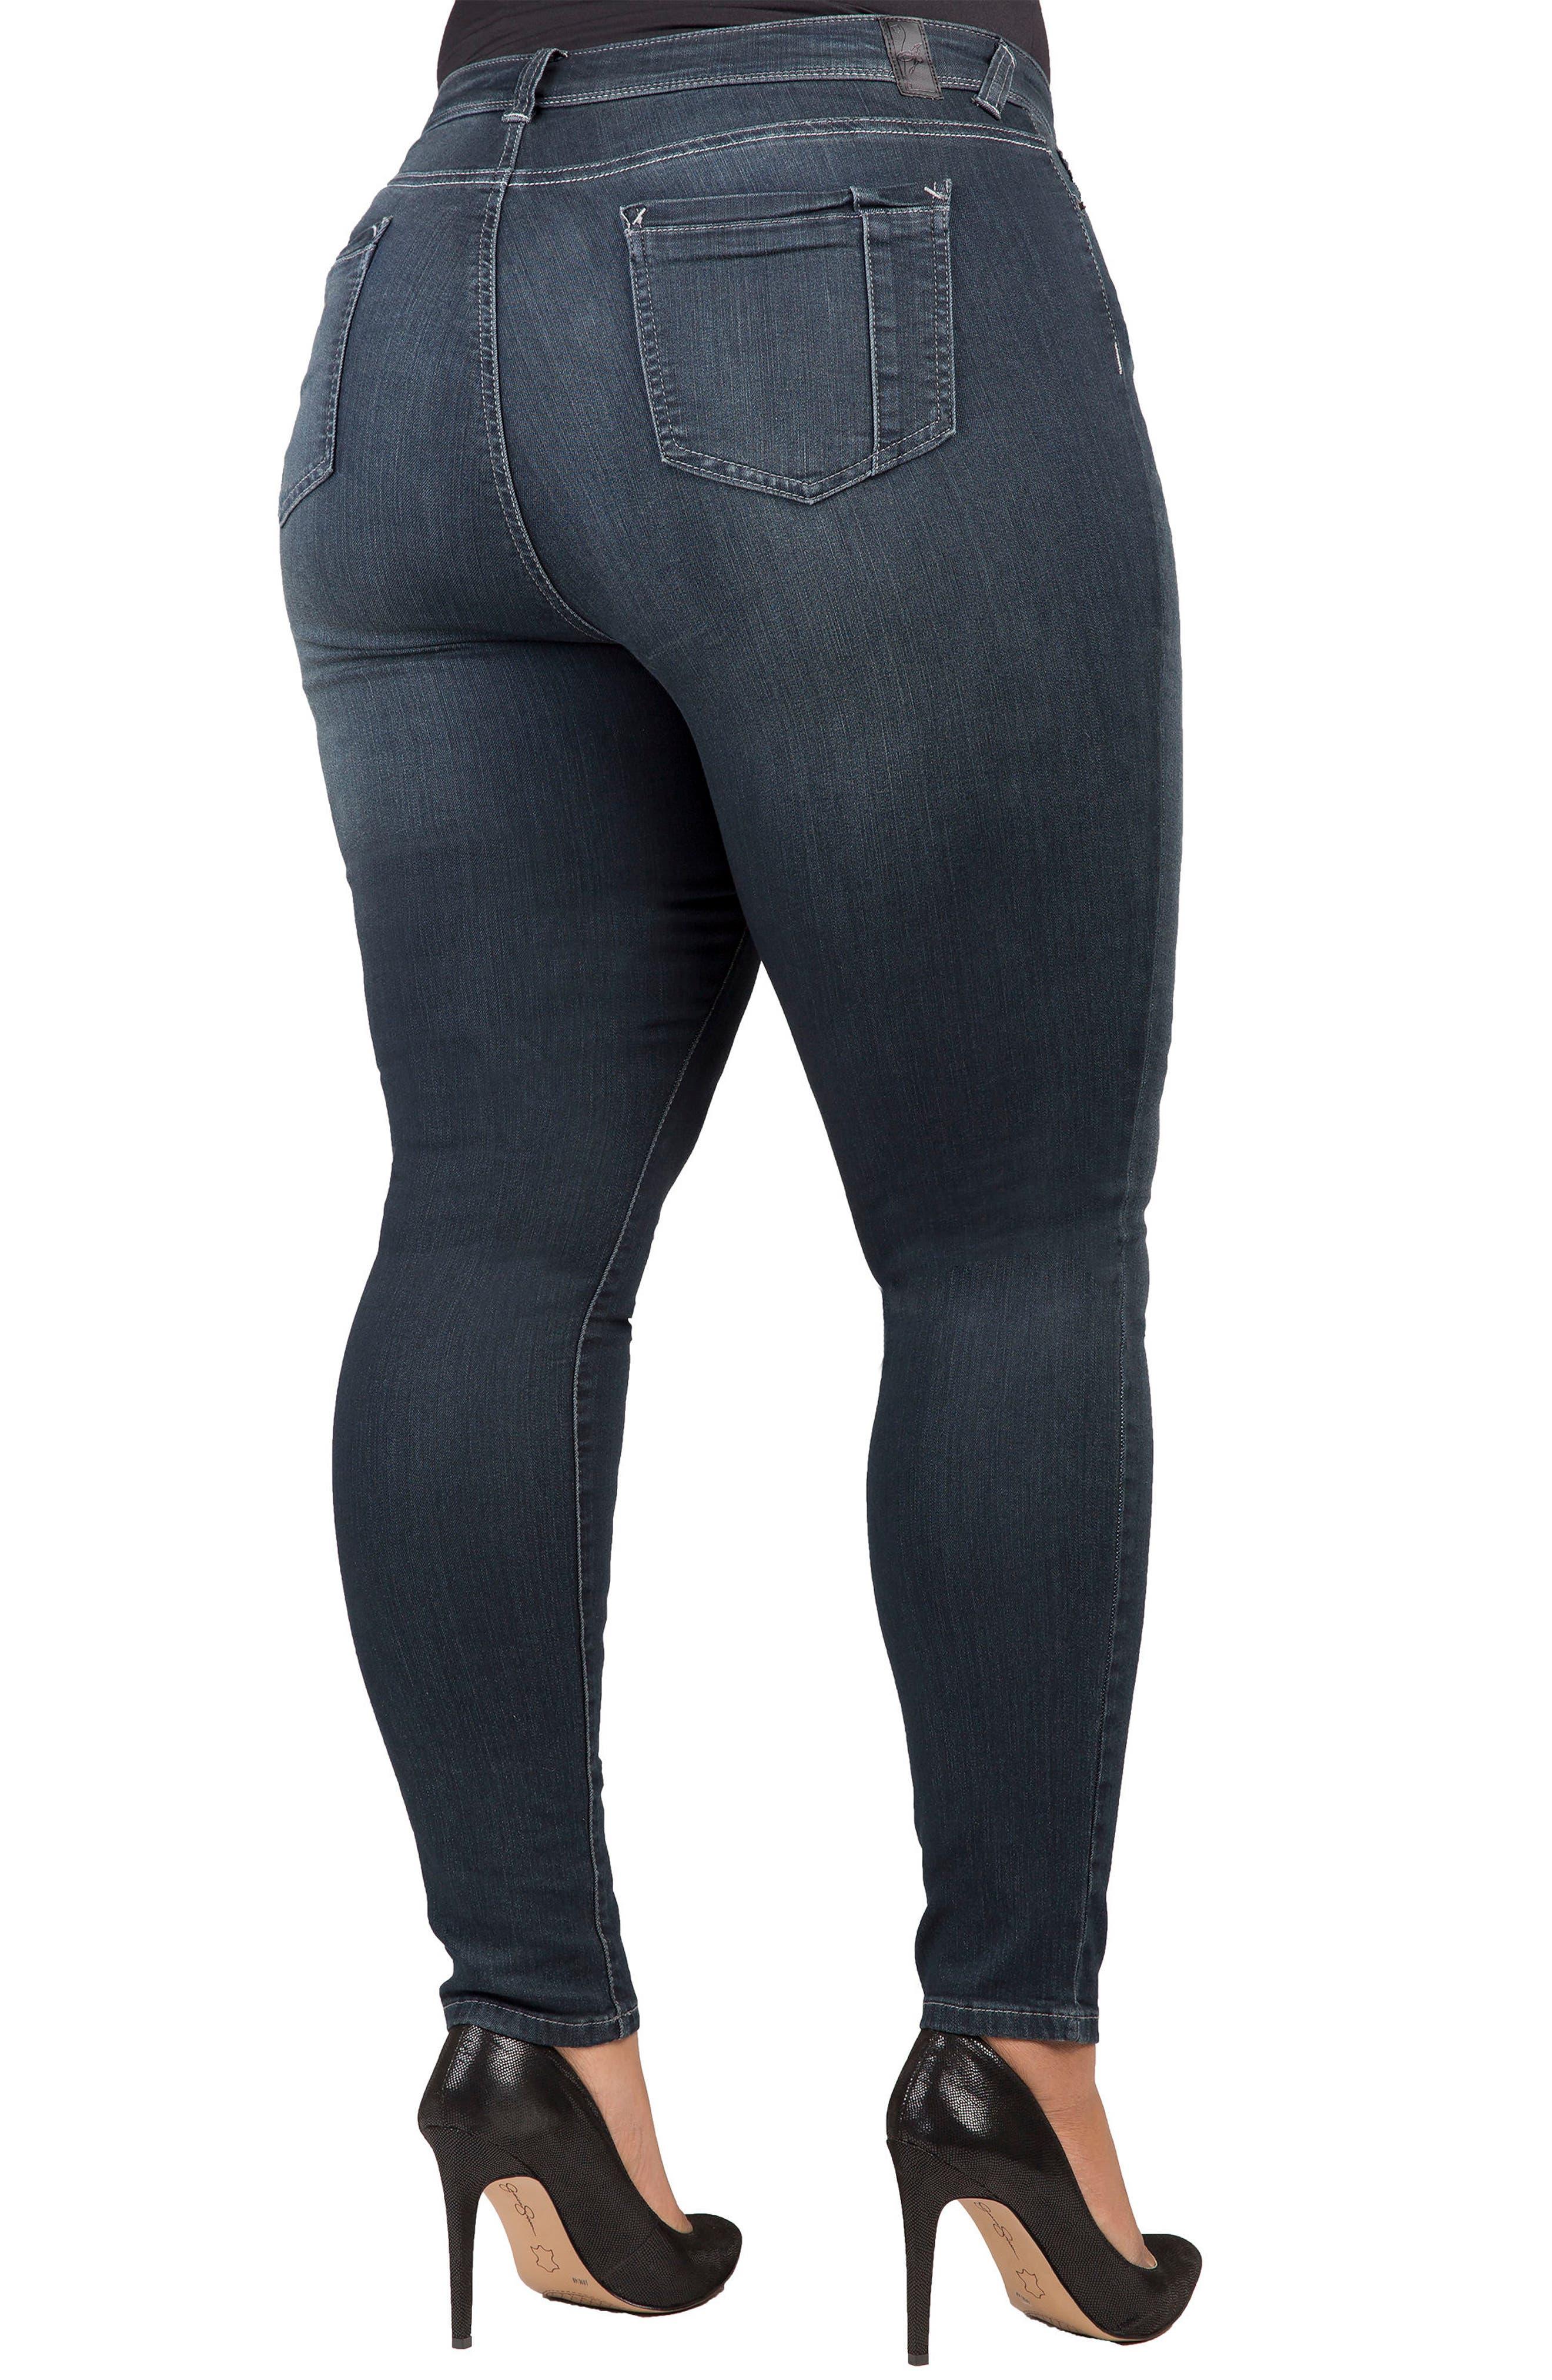 POETIC JUSTICE, 'Maya' Stretch Skinny Jeans, Alternate thumbnail 2, color, 1464KINGSC